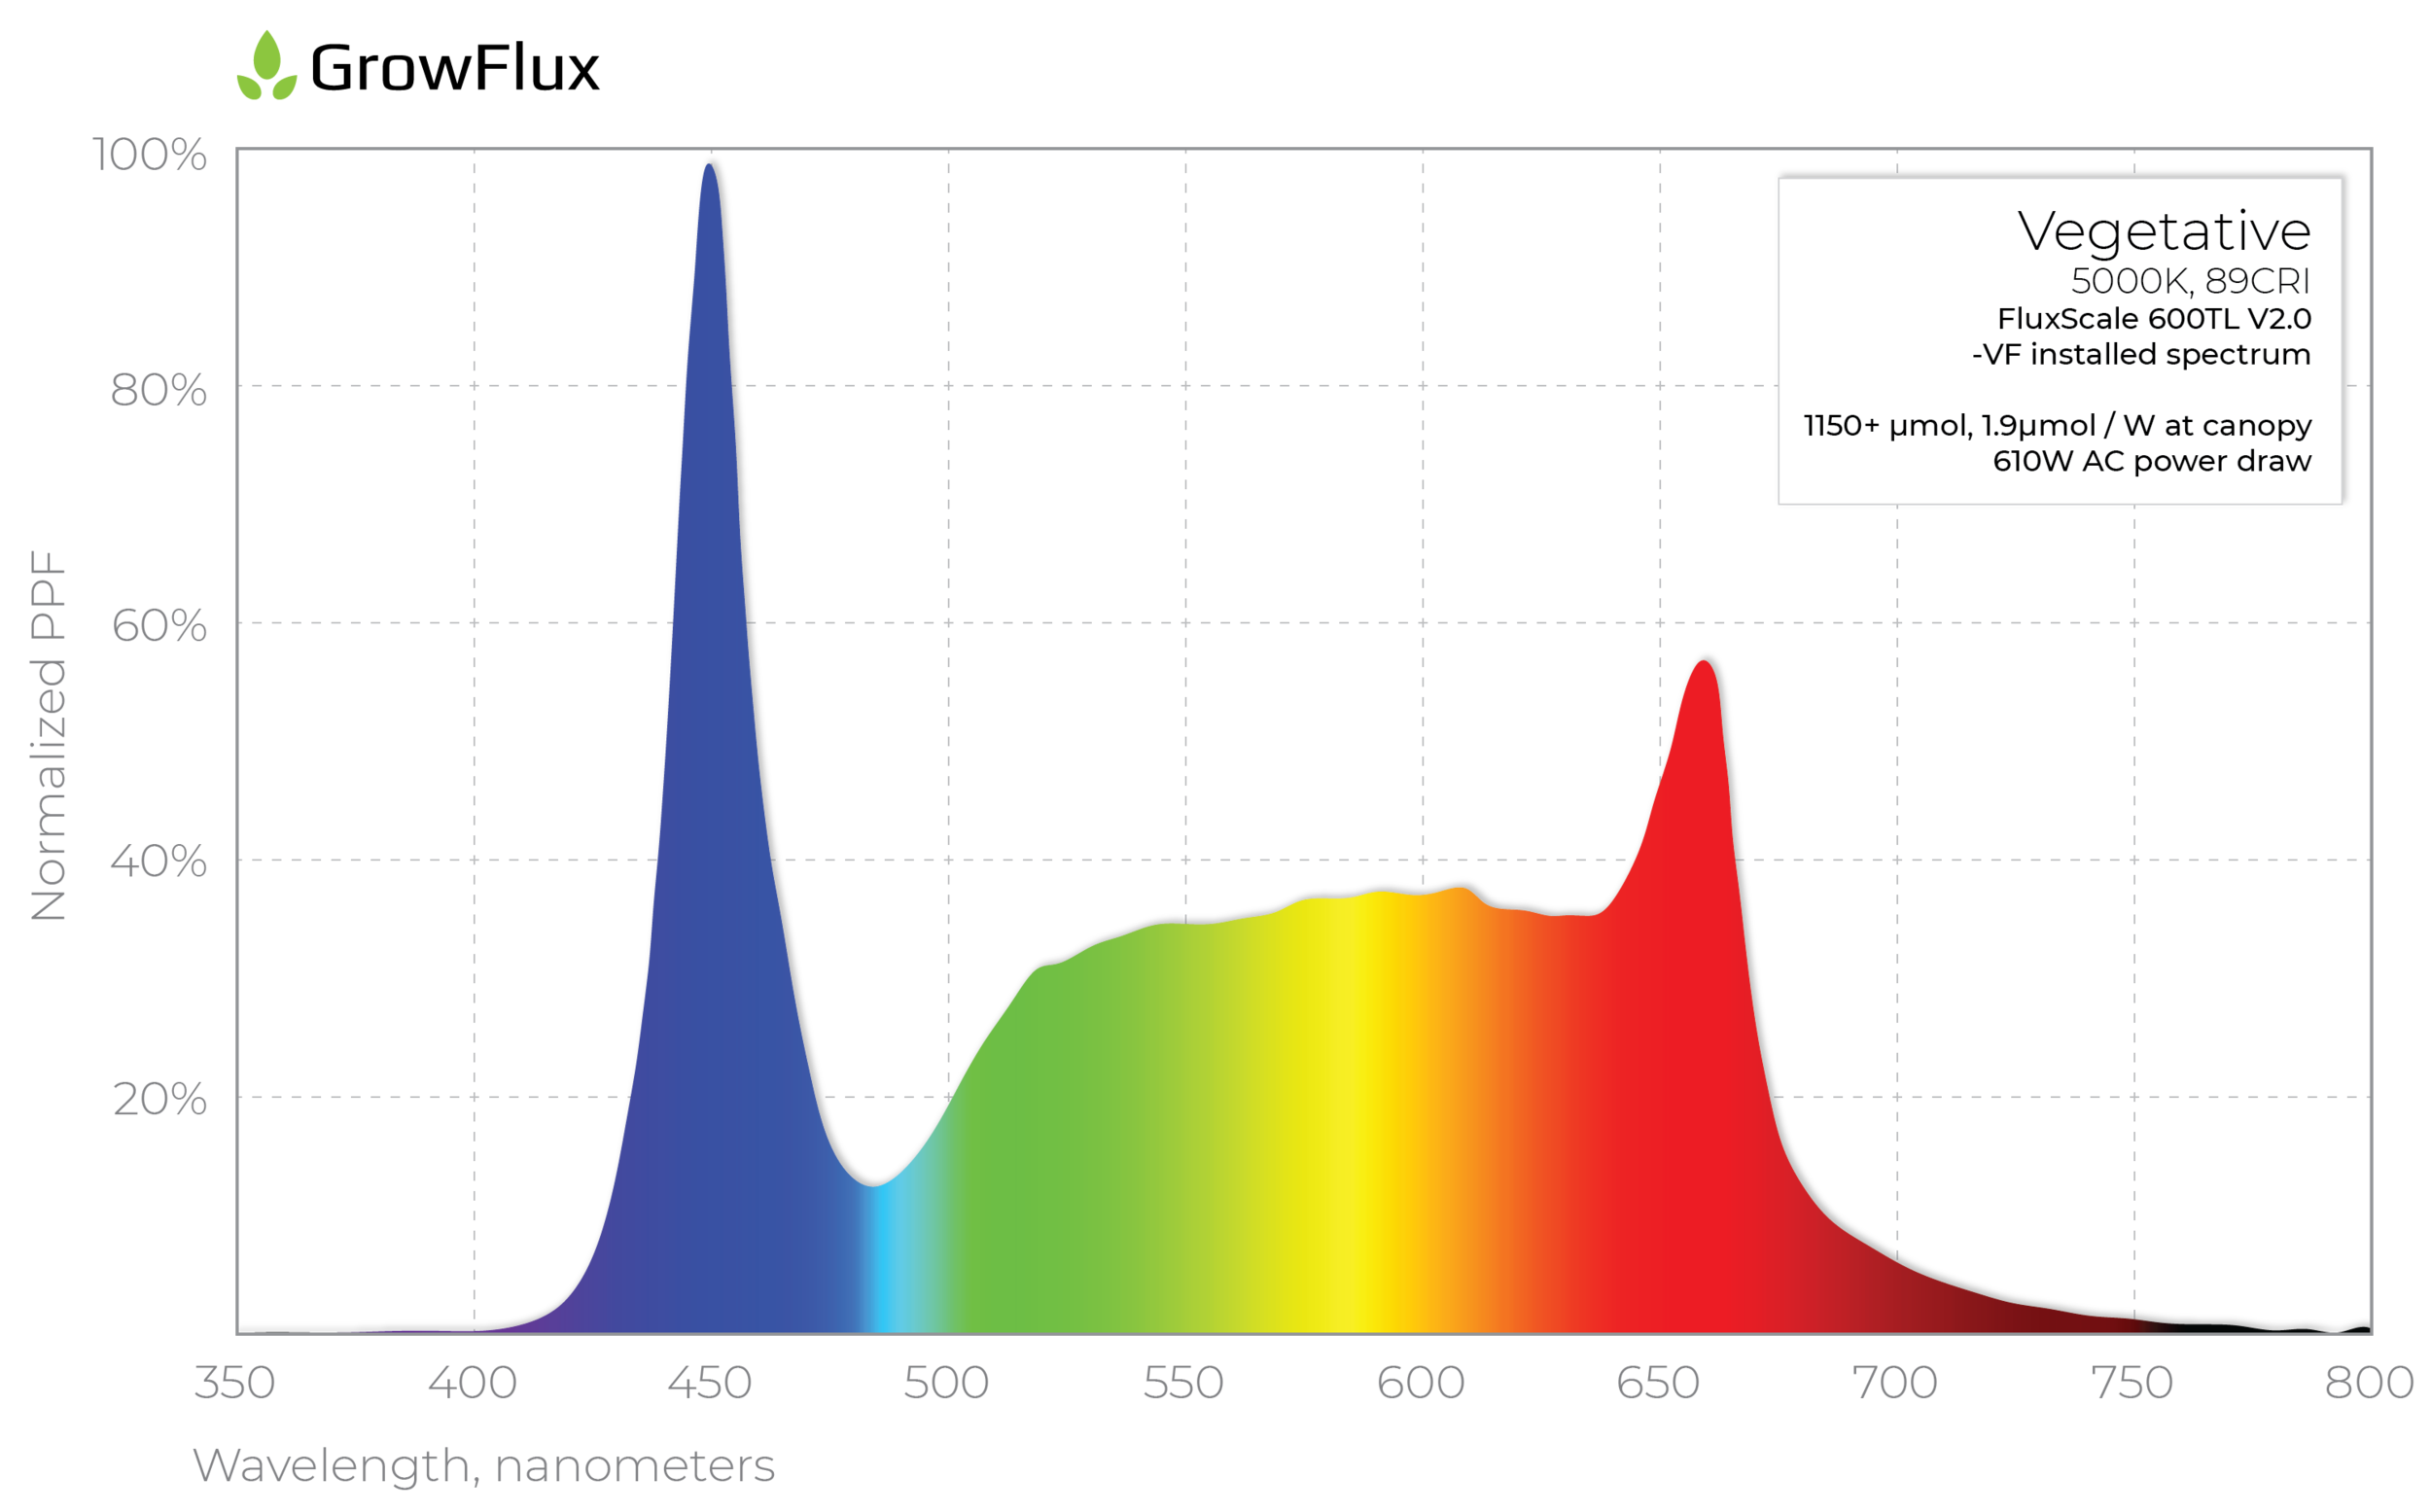 FluxScale 600TL LED grow light vegetative spectrum